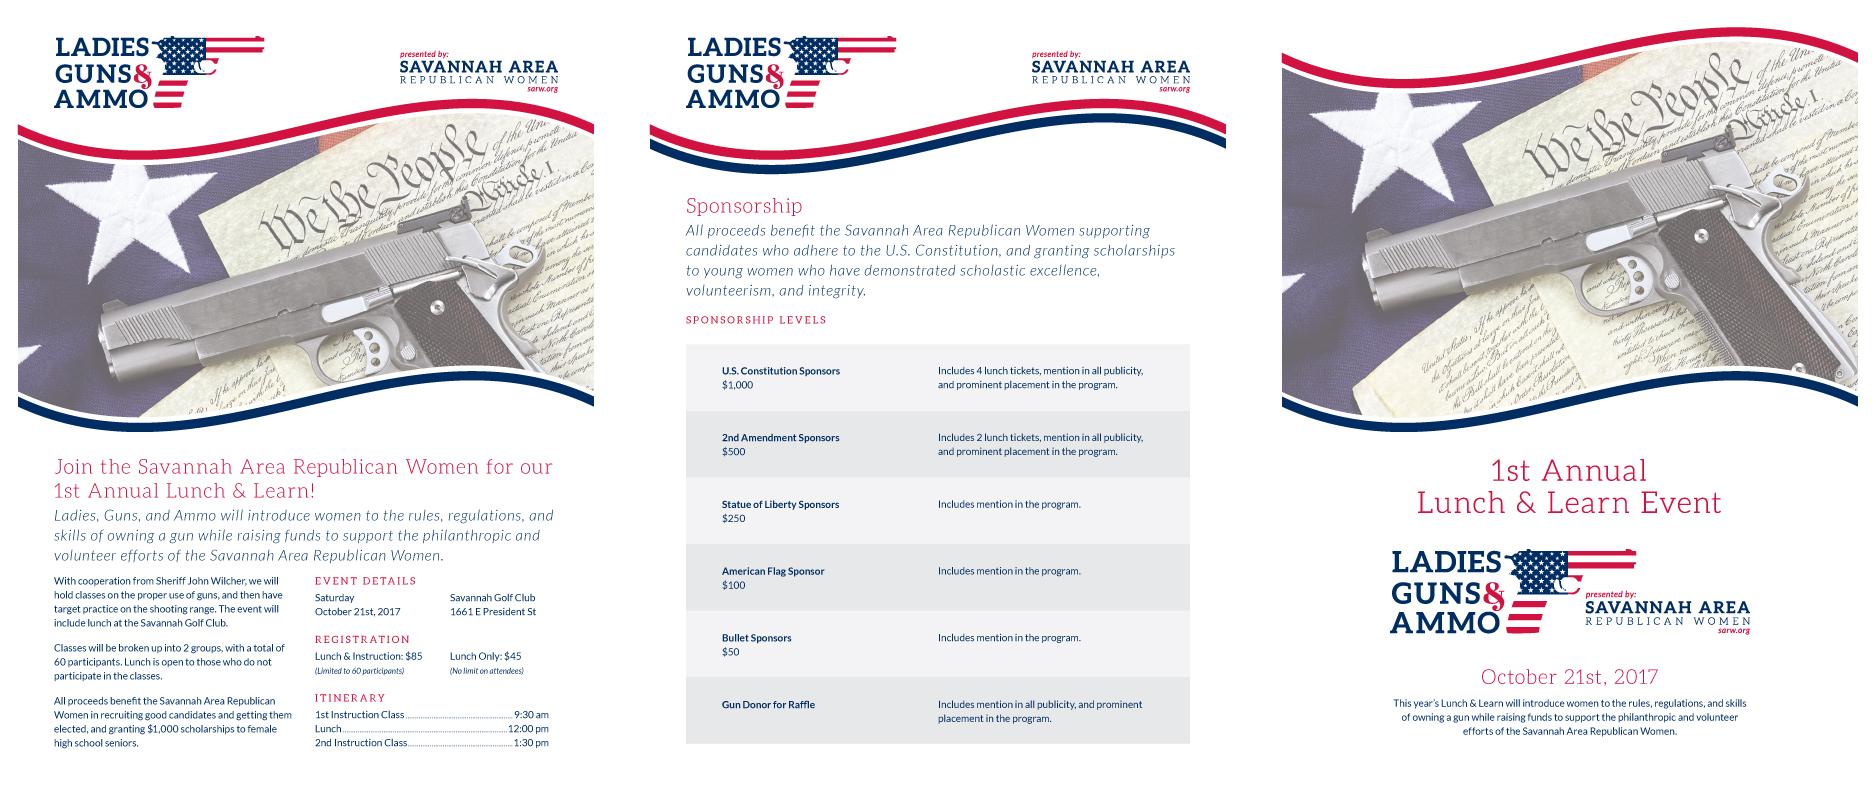 Savannah Area Republican Women - Speros Graphic Design - Savannah